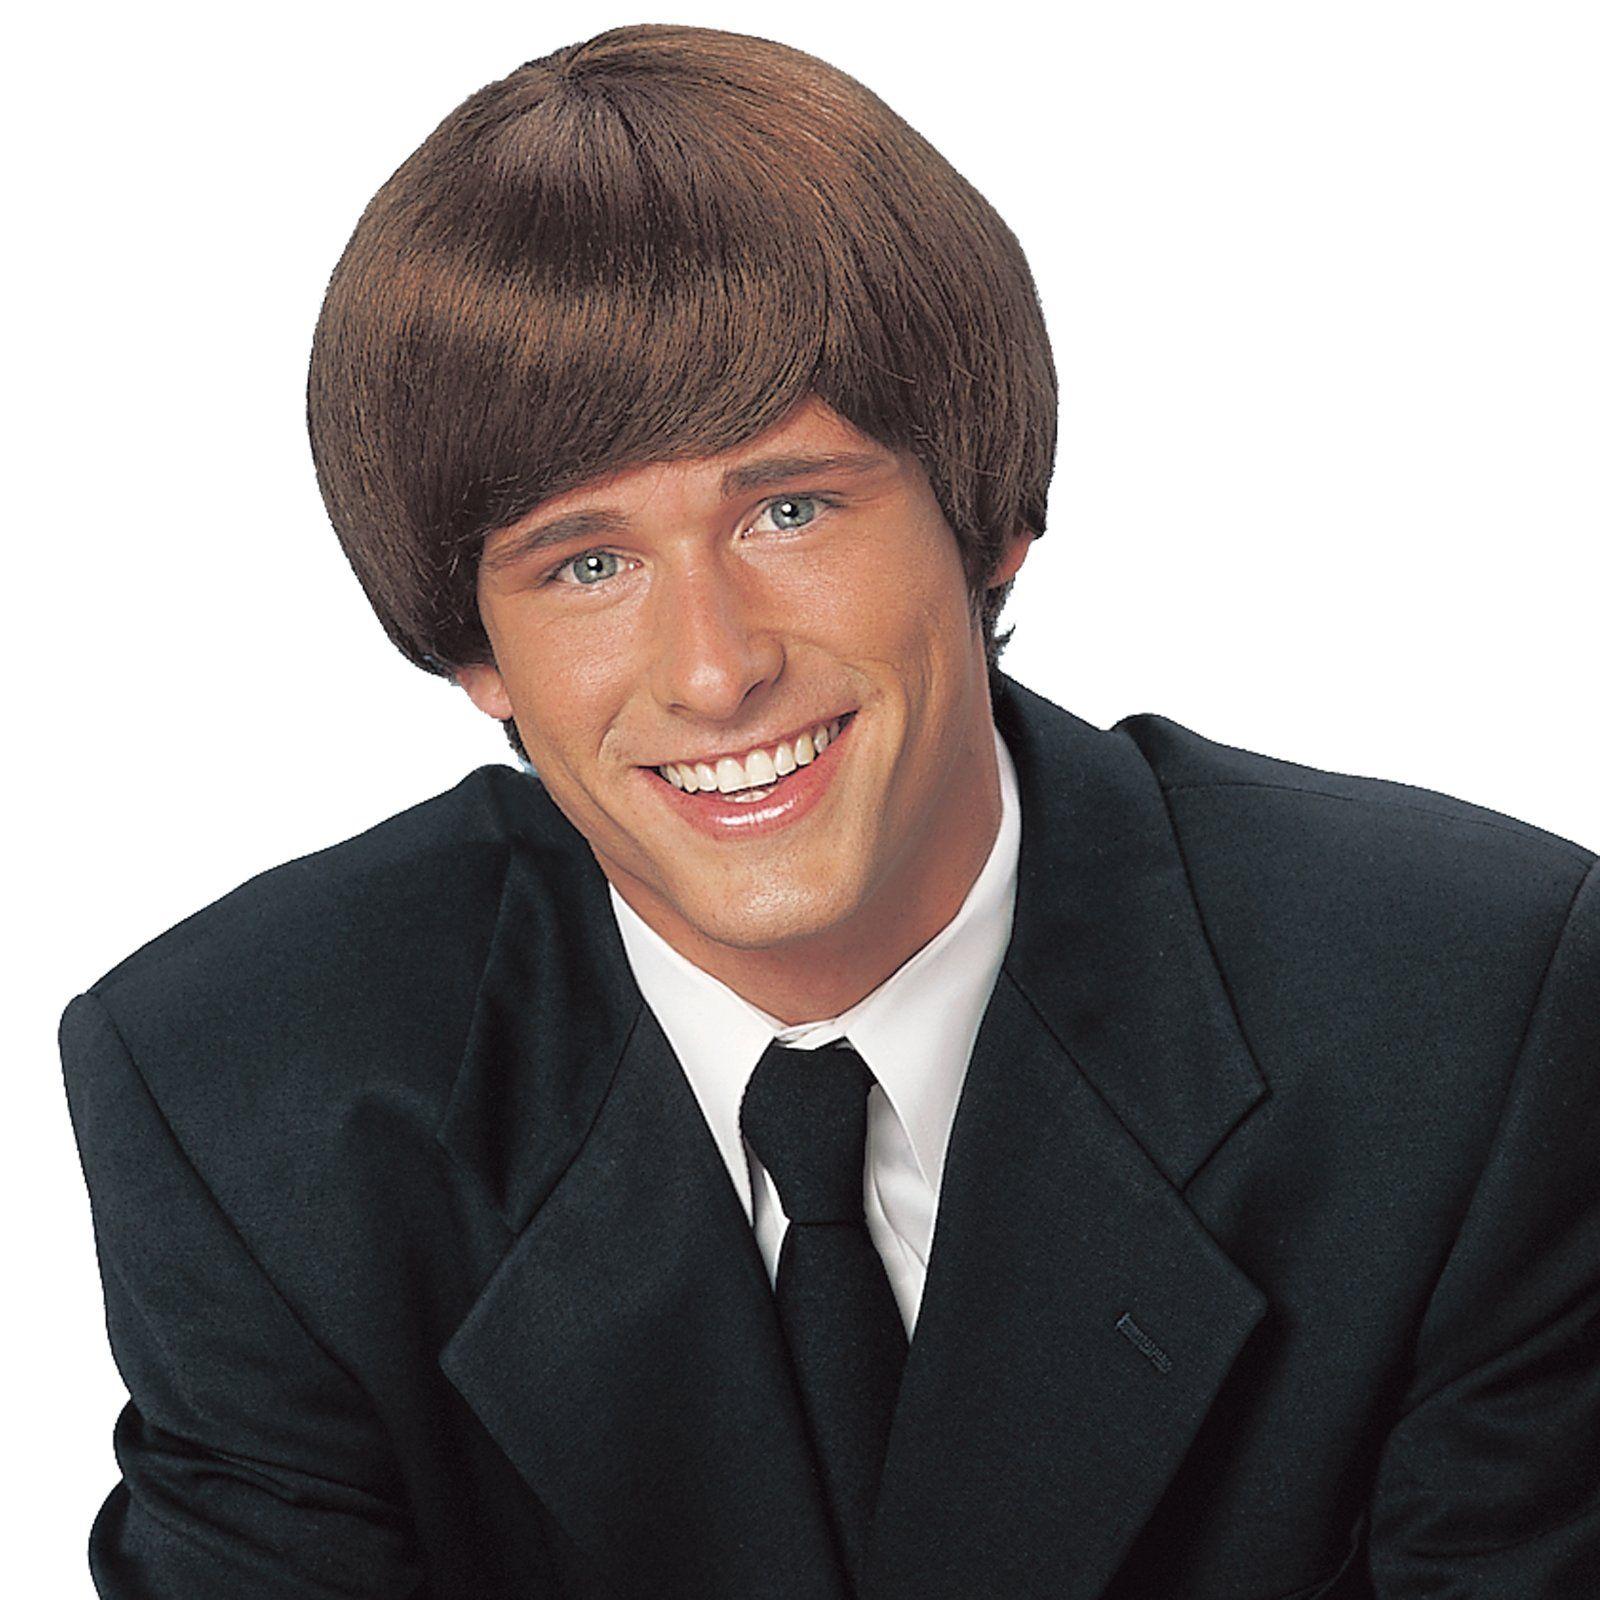 Groovy Men Short Hairstyles Asian Men And Funky Long Hairstyles On Pinterest Hairstyles For Men Maxibearus